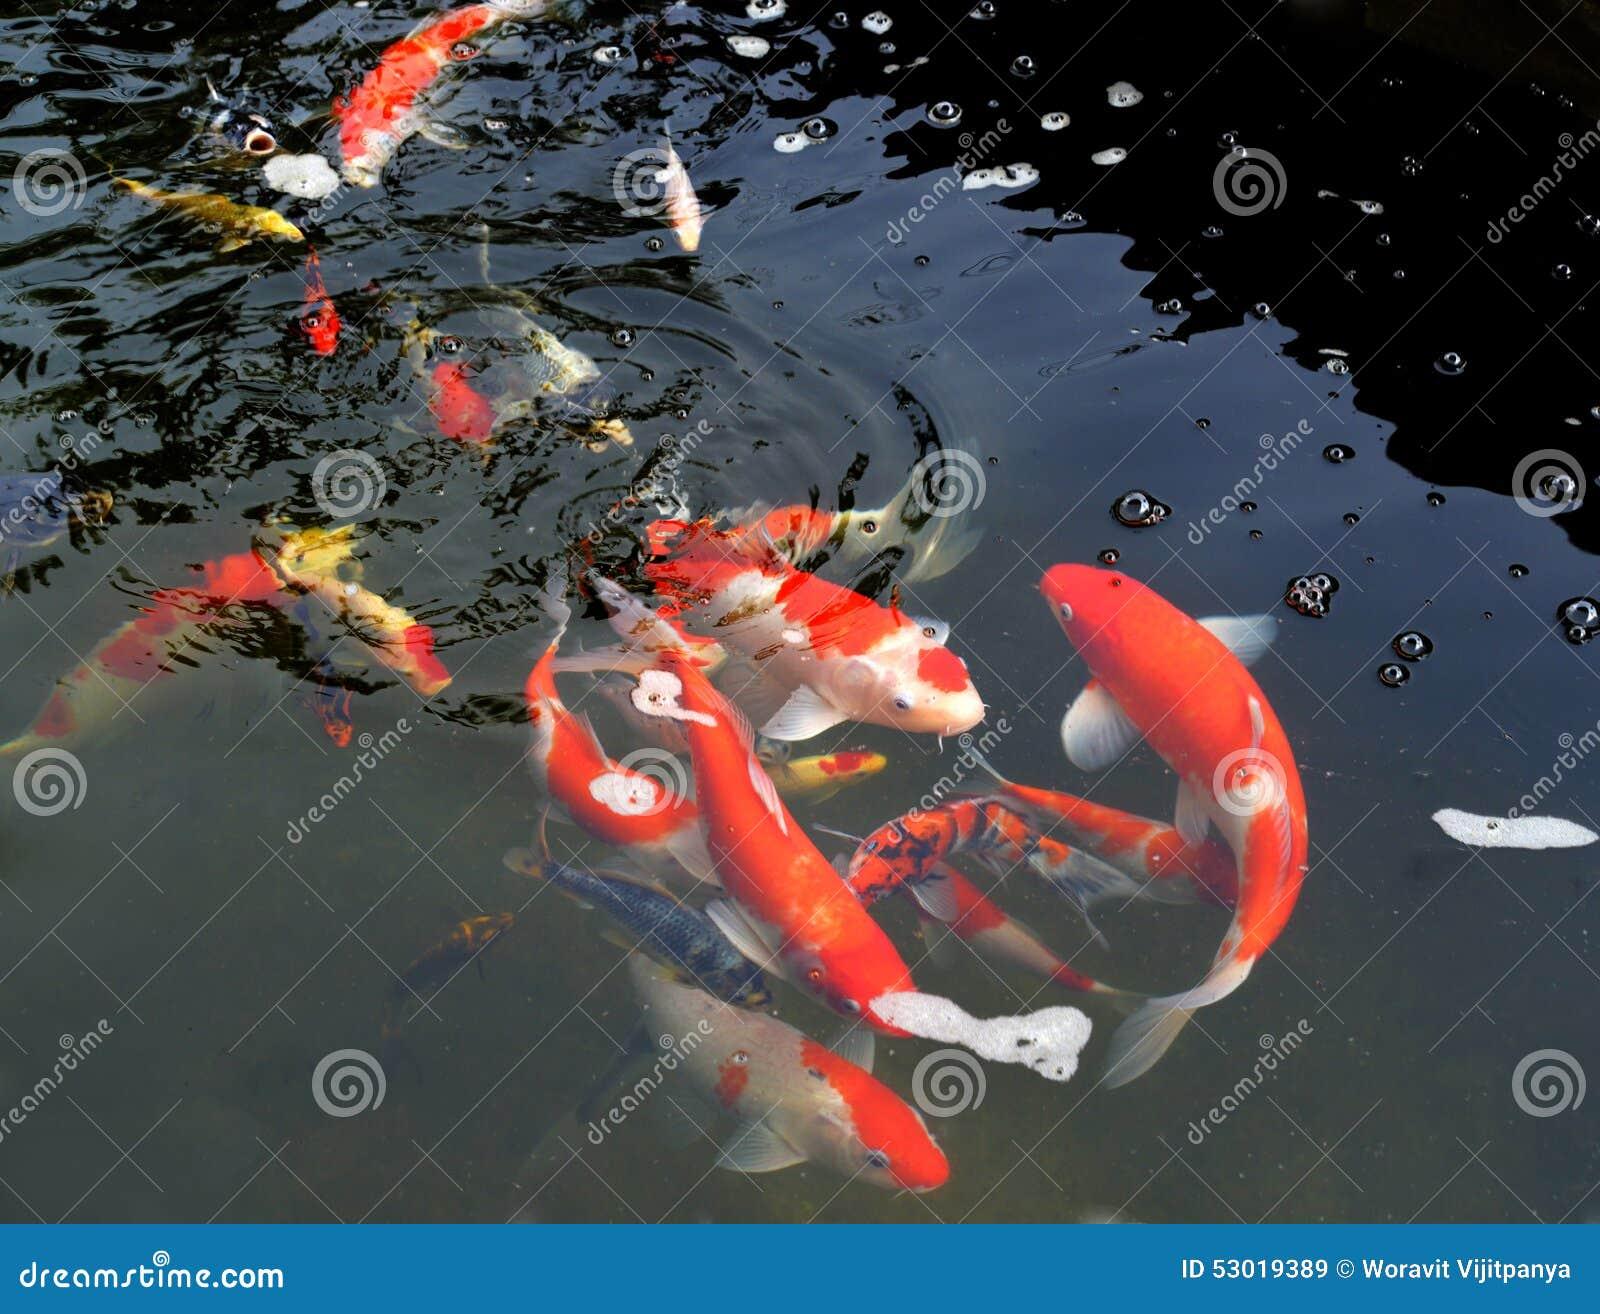 Koi pond stock photo image 53019389 for Colorful pond fish